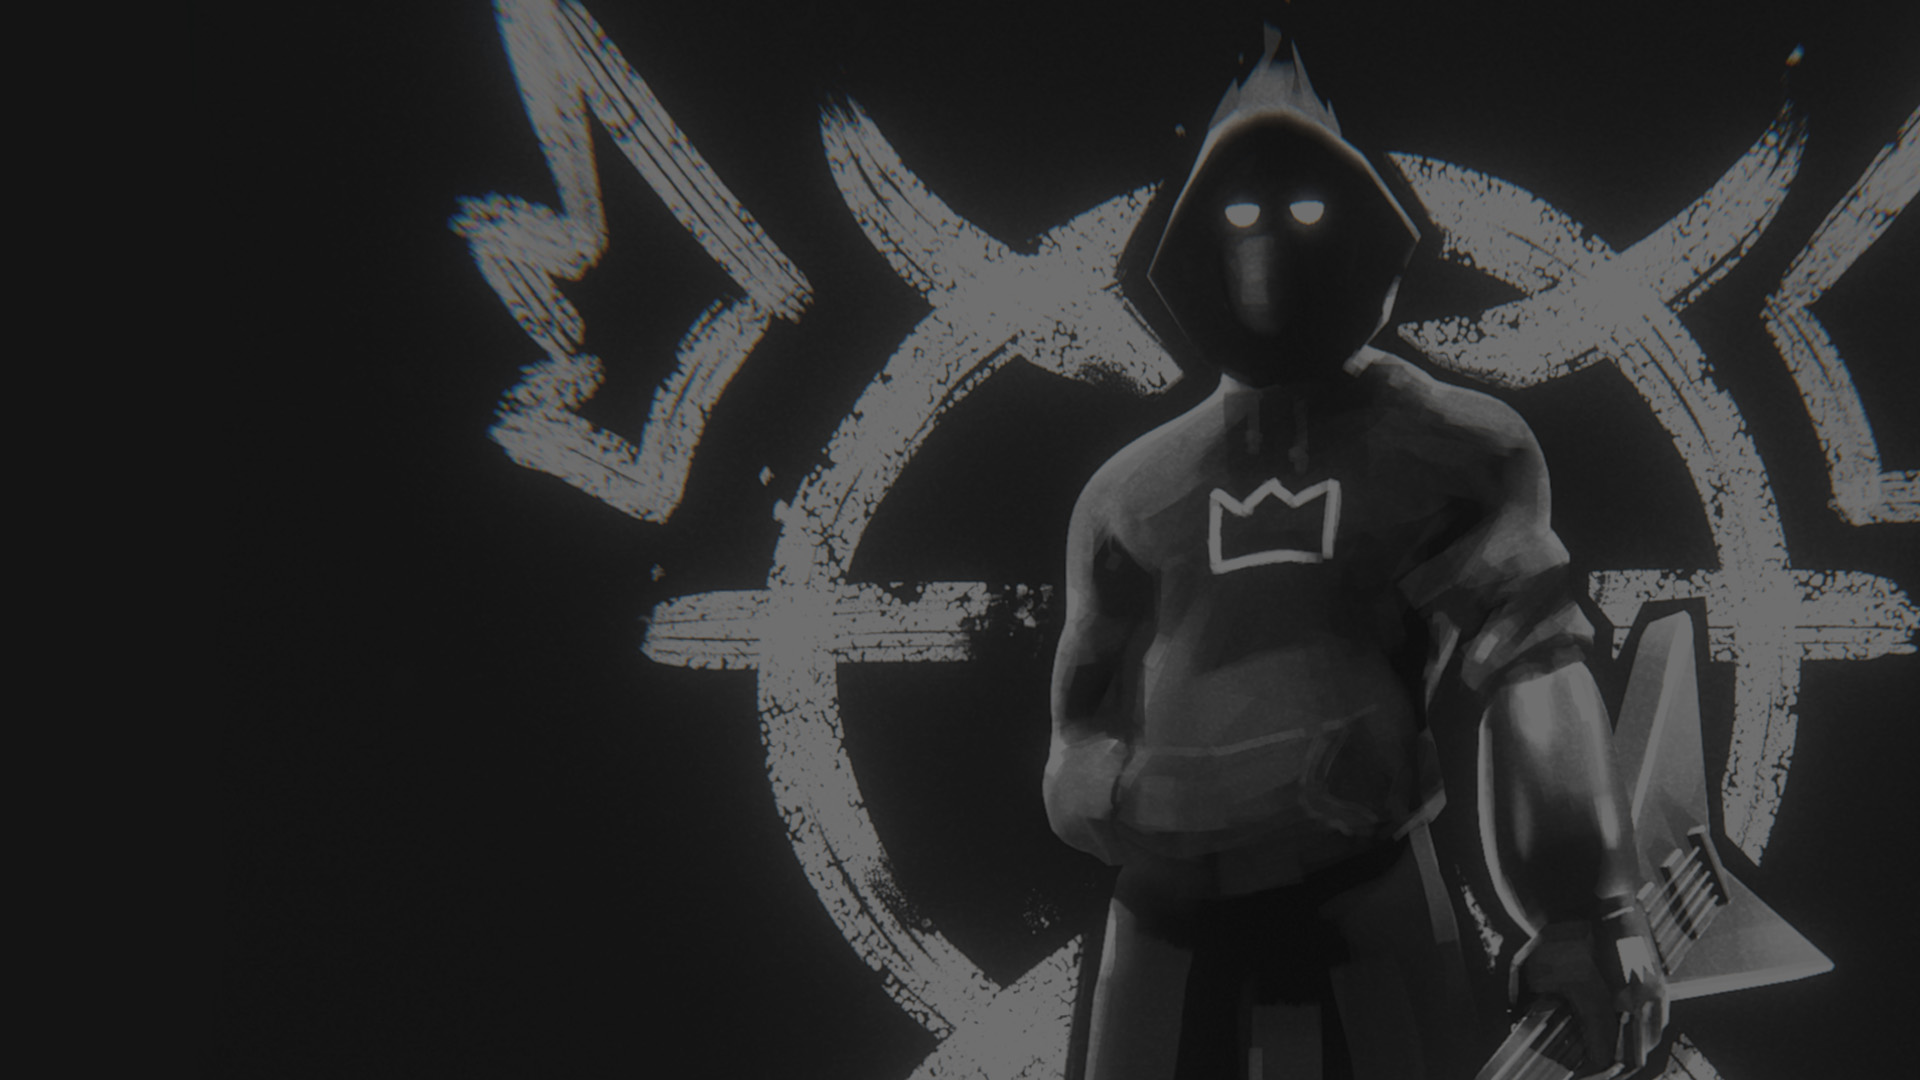 atomsk character fan art black and white banner